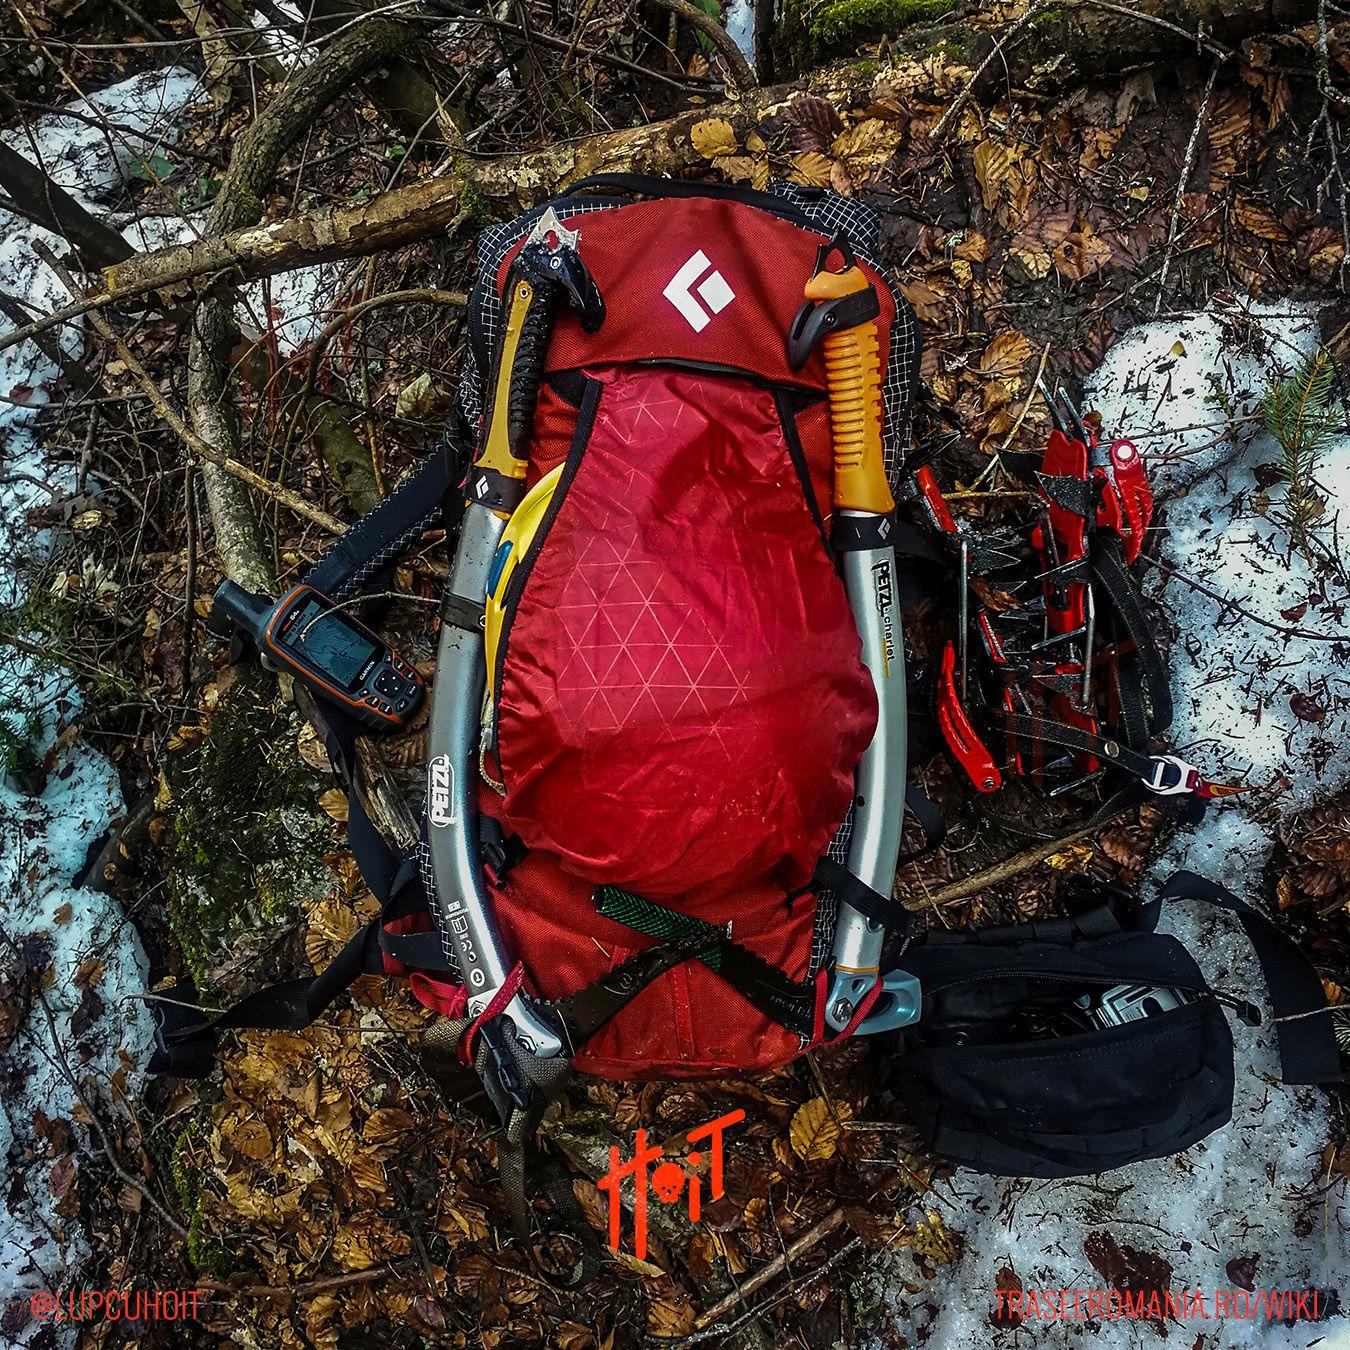 Lista echipament montan pentru alpinism si escalada